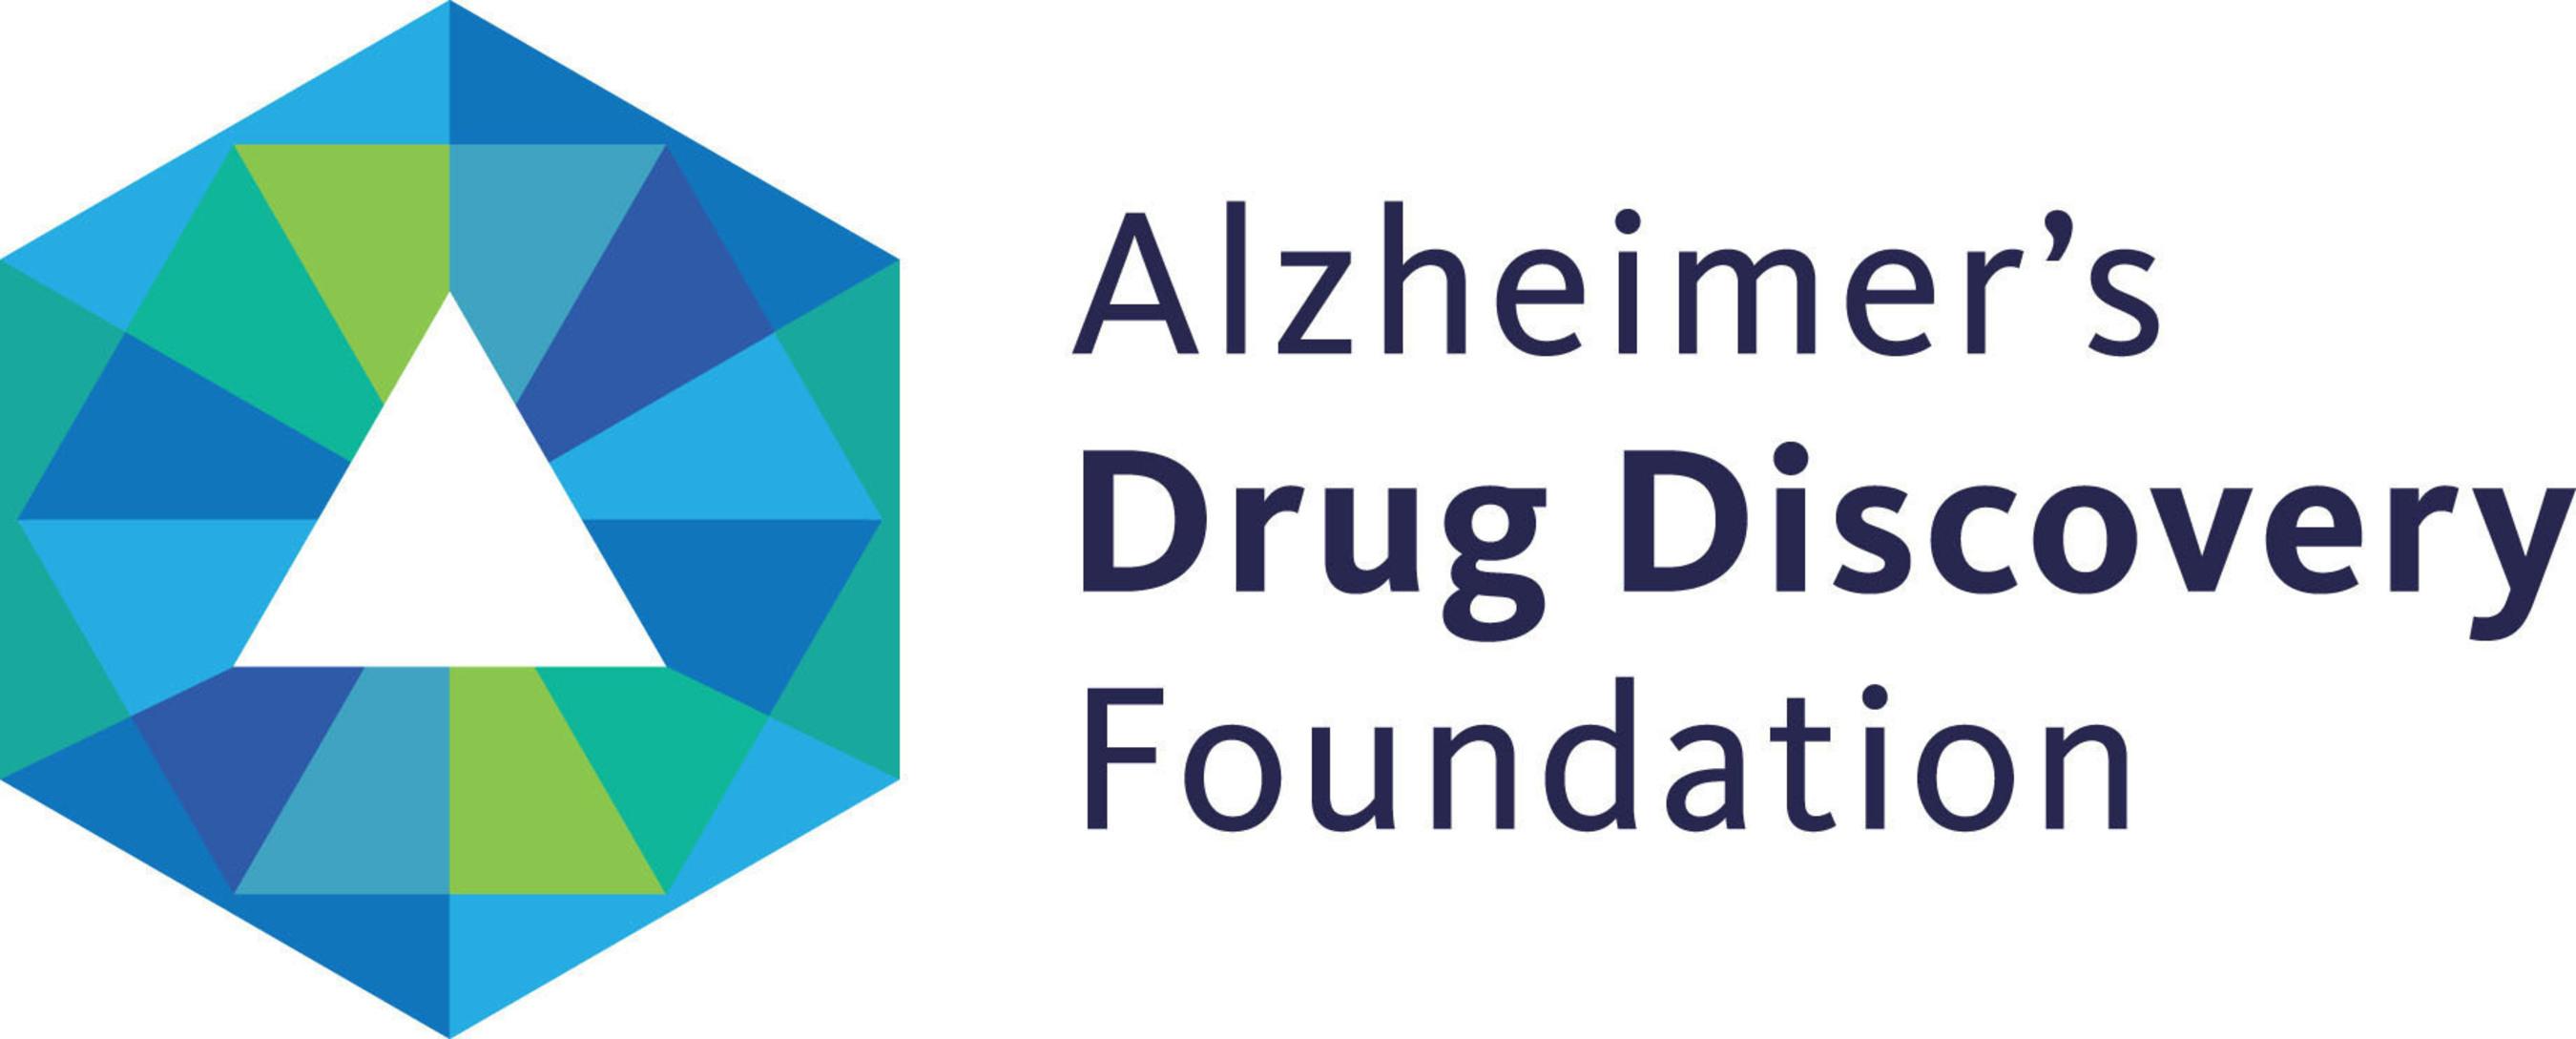 Alzheimer's Drug Discovery Foundation.